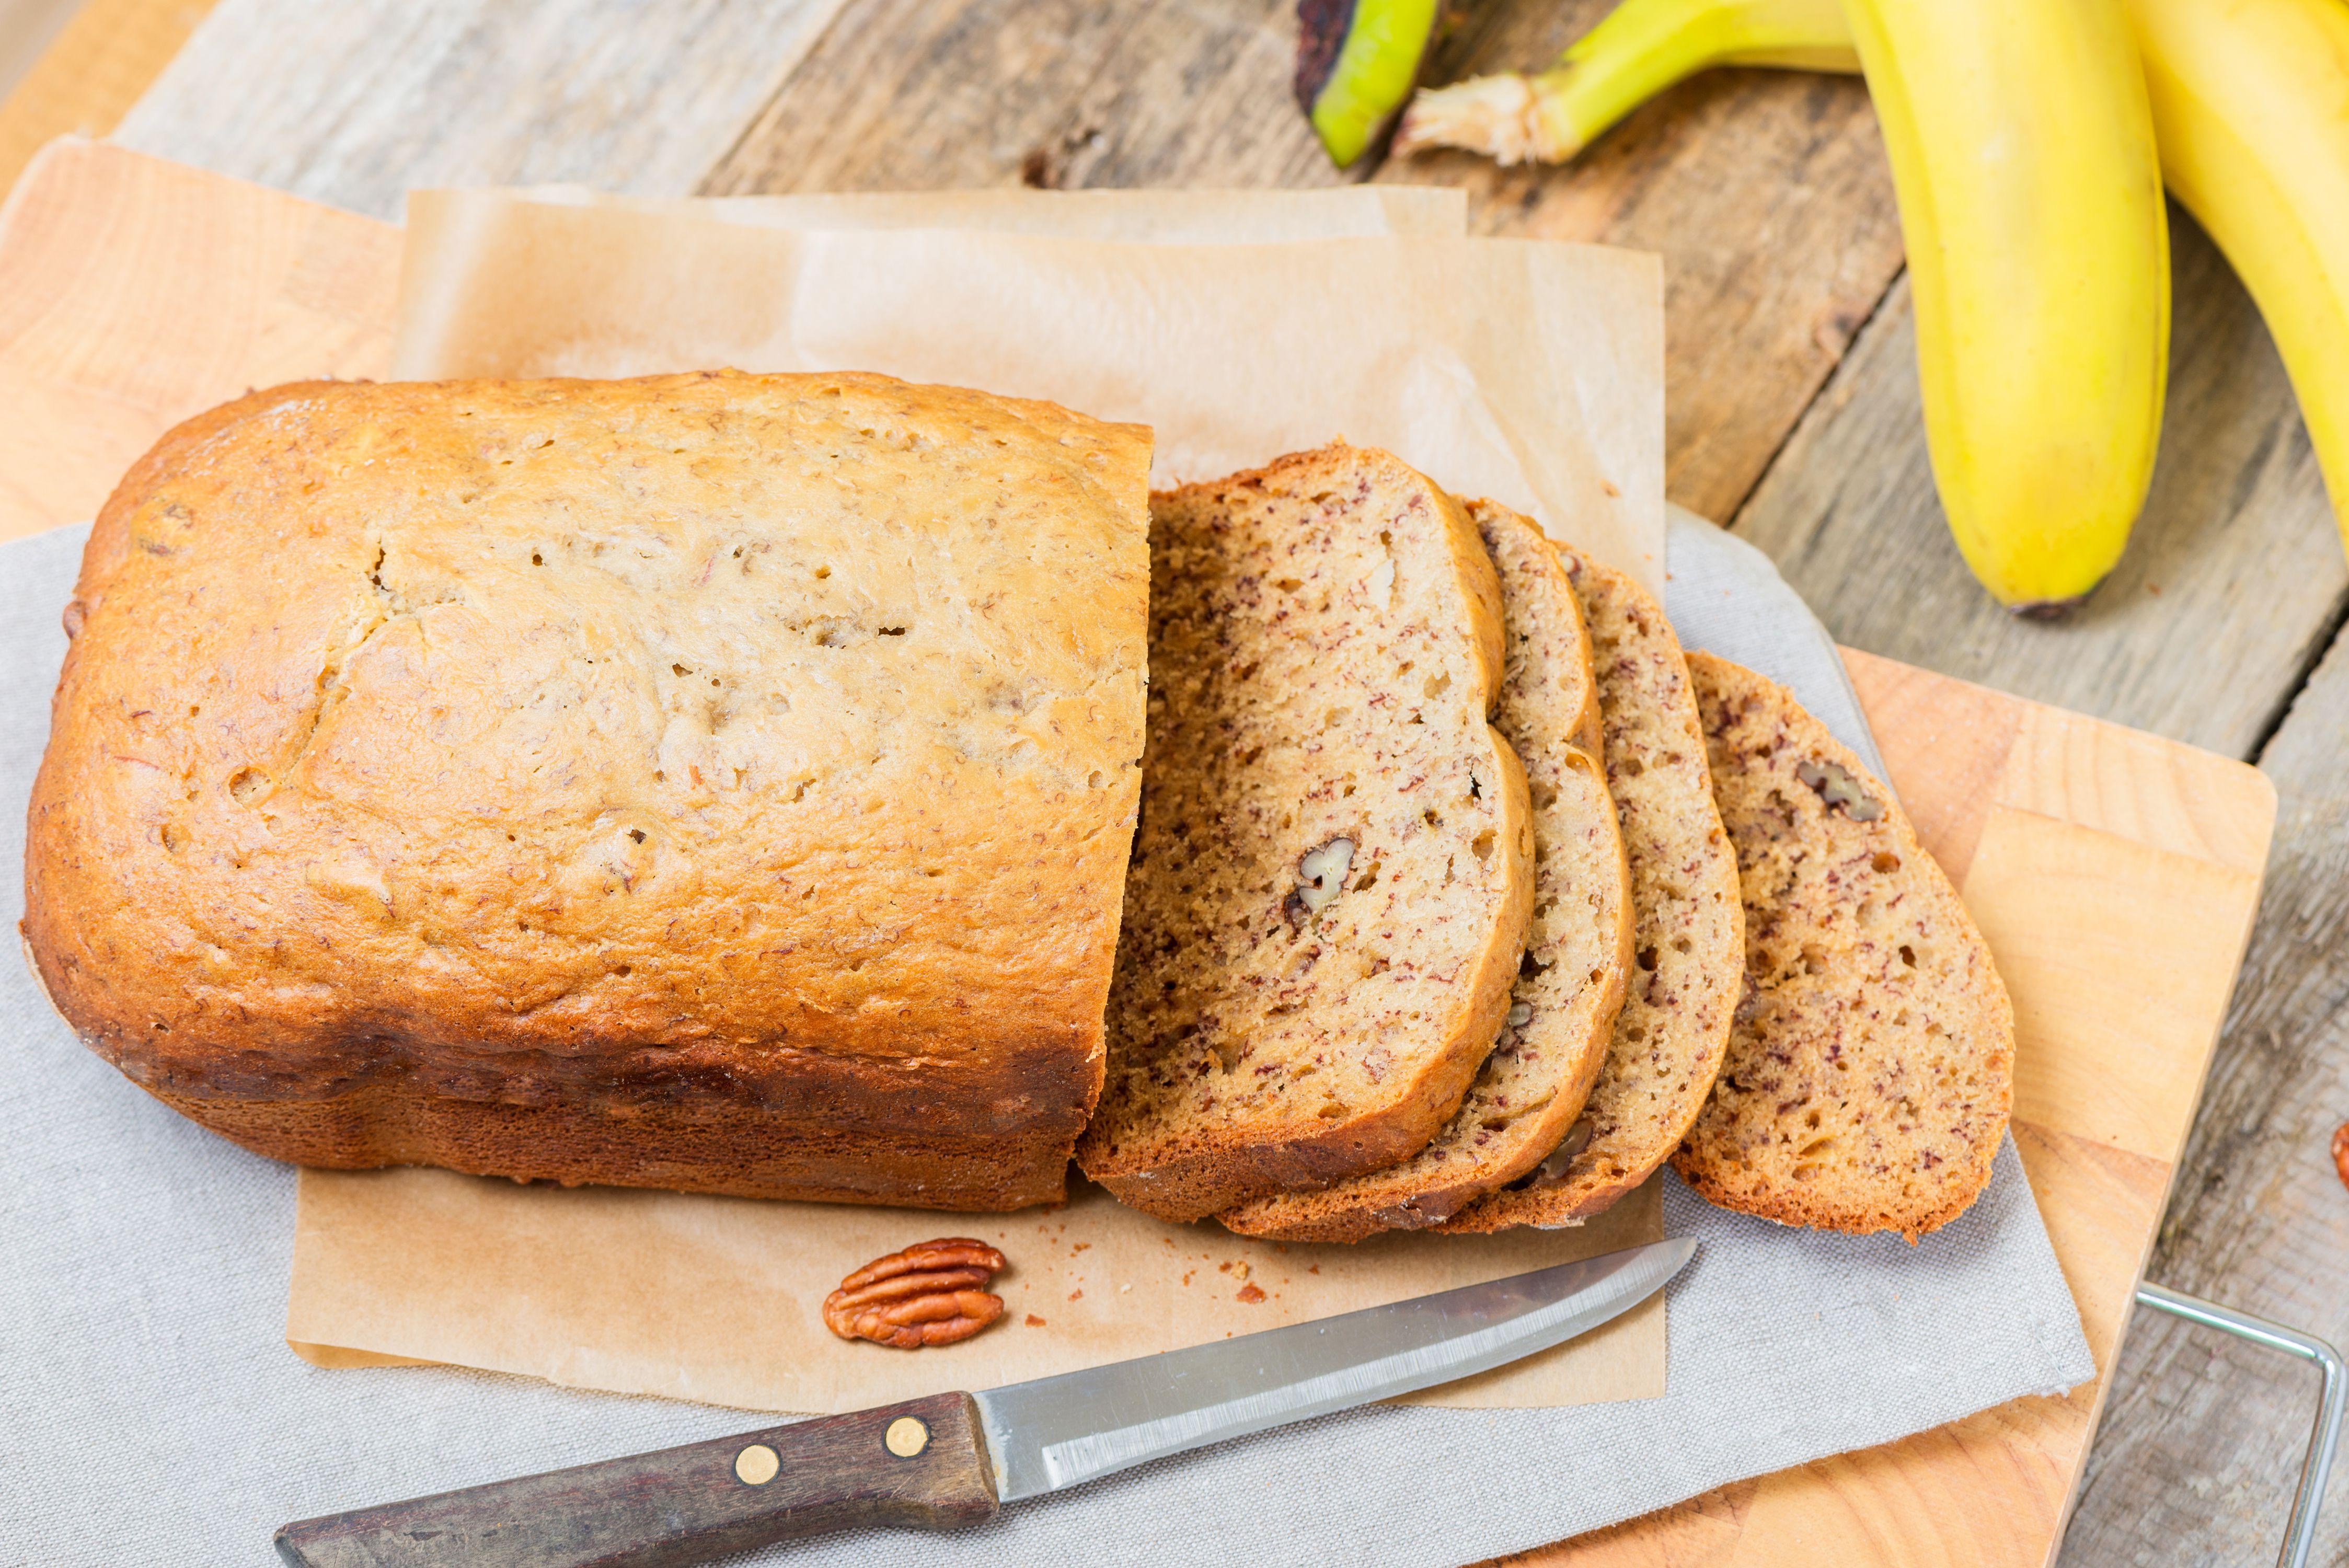 A Recipe for Making Banana Bread in a Bread Machine